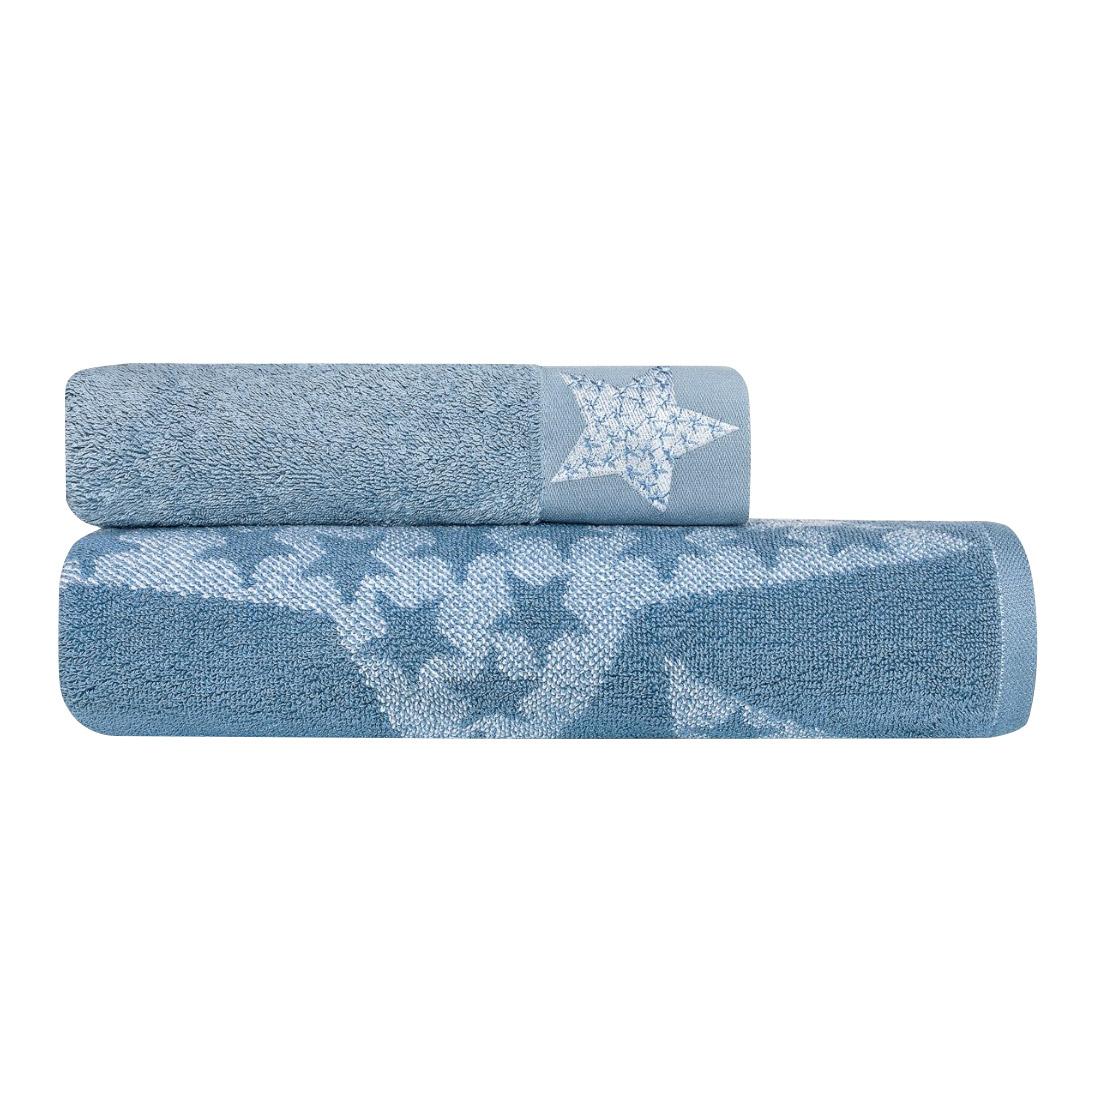 Фото - Комплект полотенец Togas Магеллан белый/голубой 2 пр 50х100/70х140 комплект полотенец togas миэль темно серый 2 пр 50х100 70х140